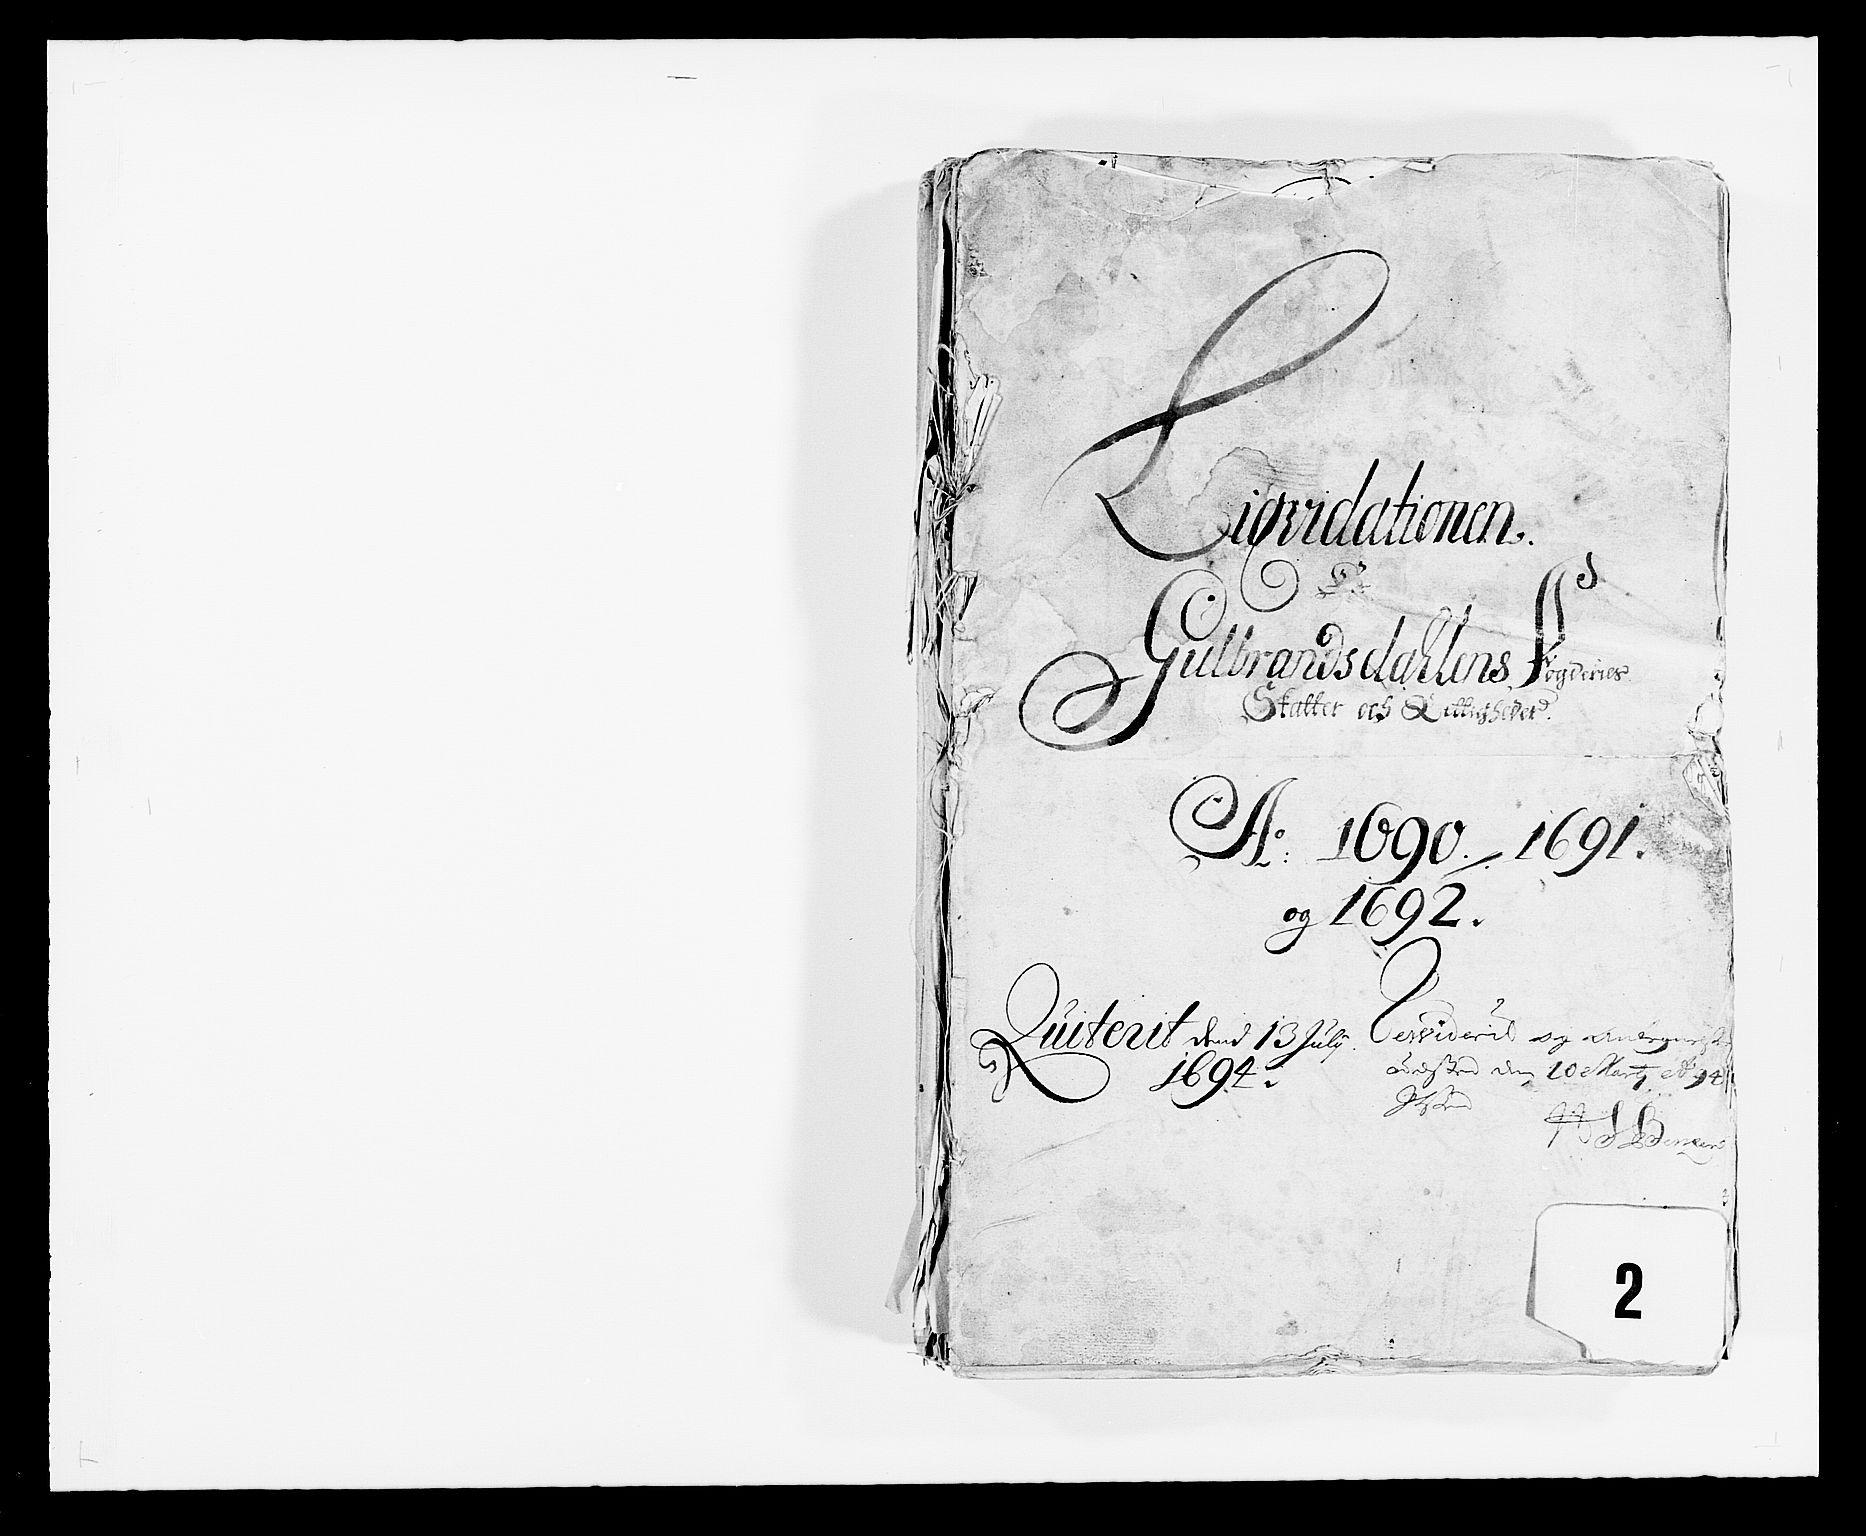 RA, Rentekammeret inntil 1814, Reviderte regnskaper, Fogderegnskap, R17/L1165: Fogderegnskap Gudbrandsdal, 1690-1692, s. 1